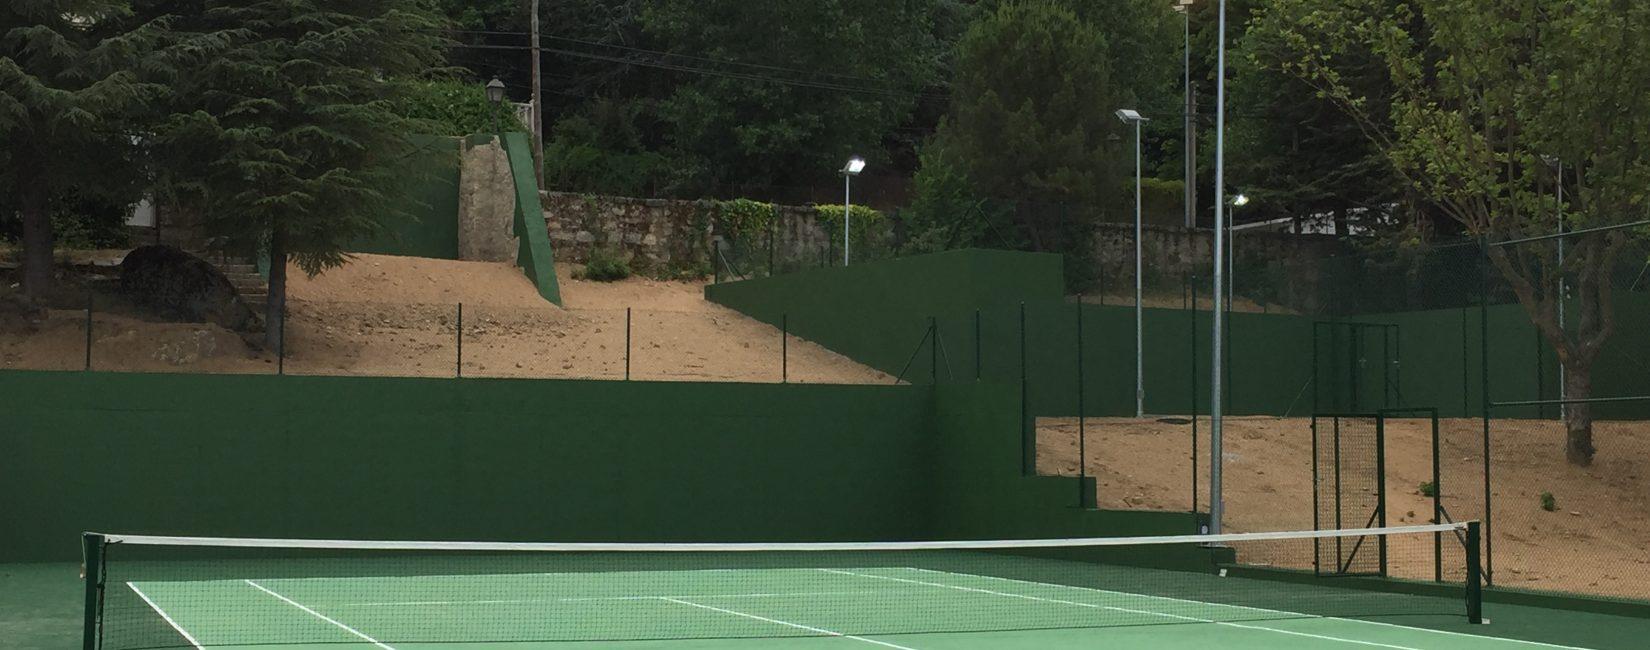 Obra Dotacional - Pistas de Tenis